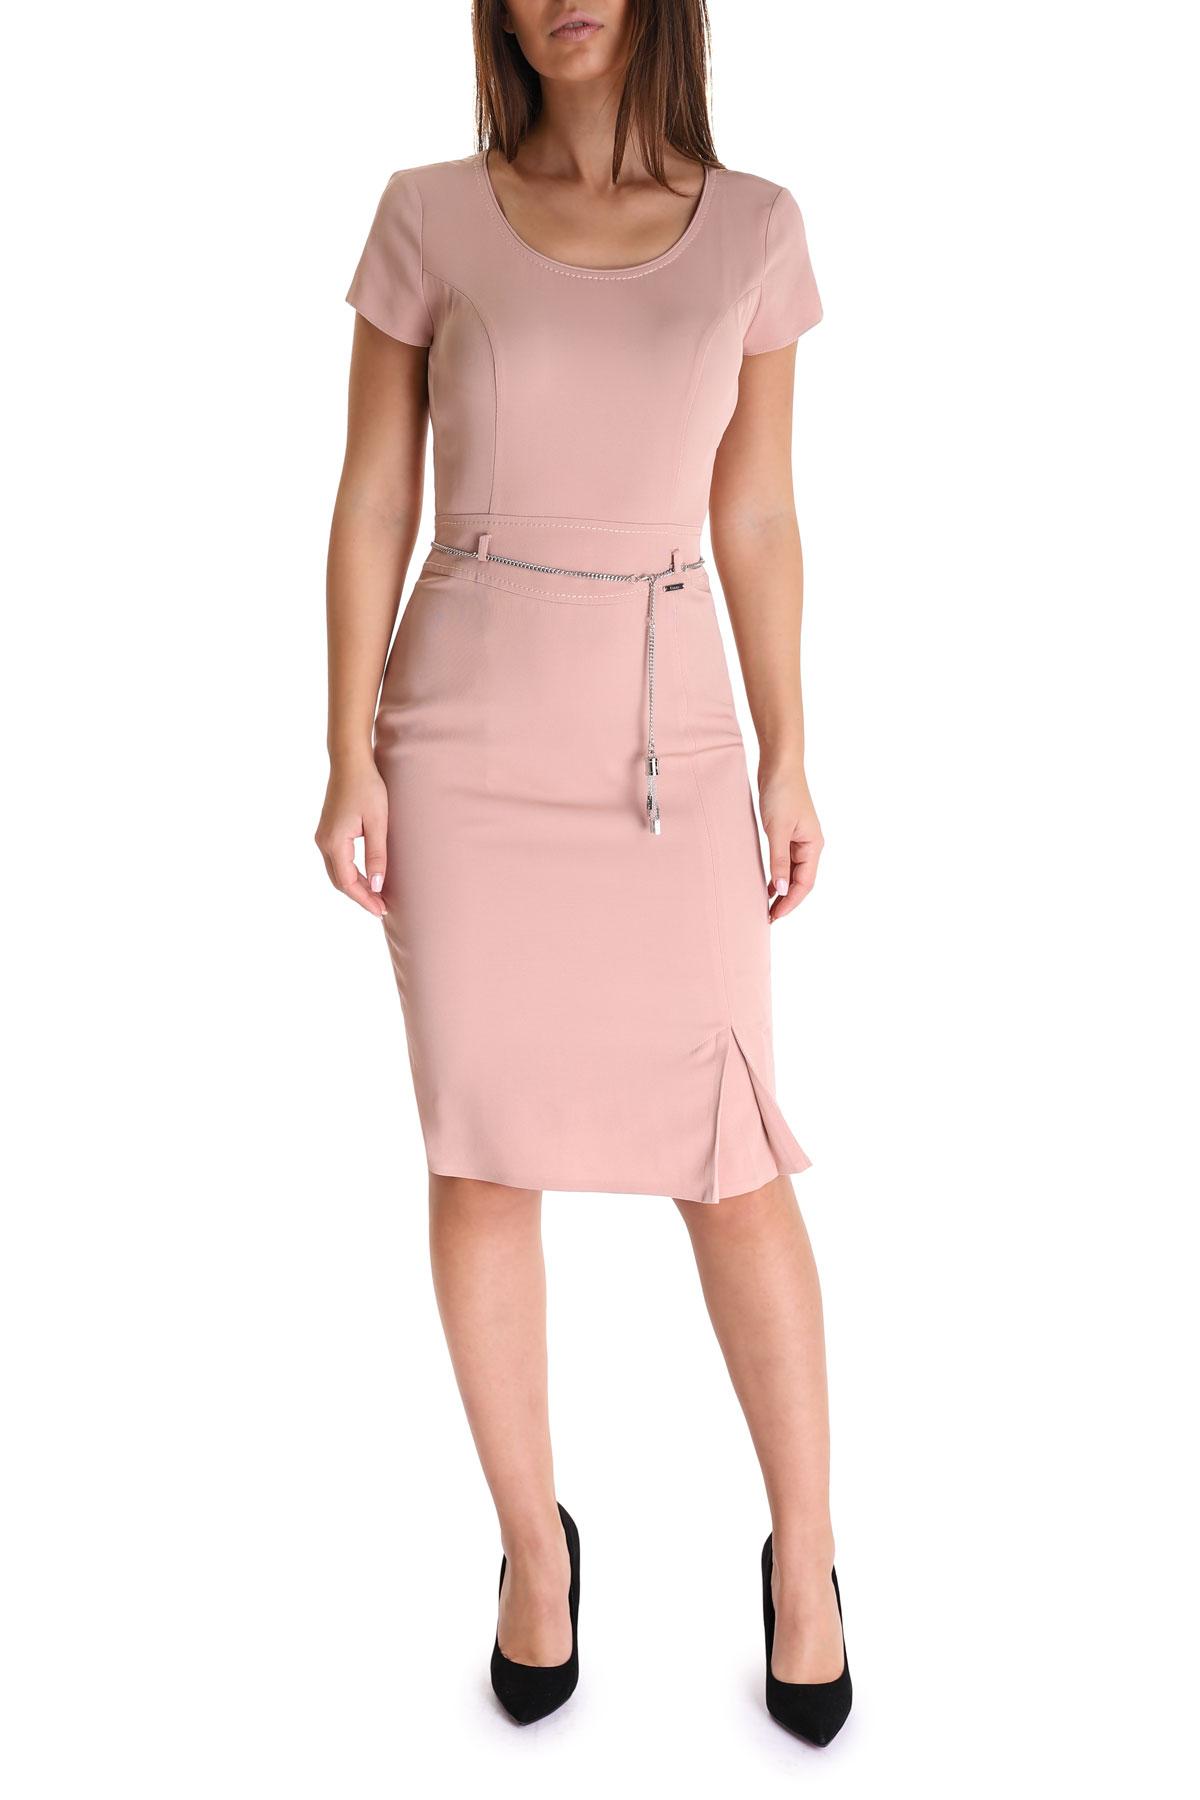 NARROW DRESS BLANKA